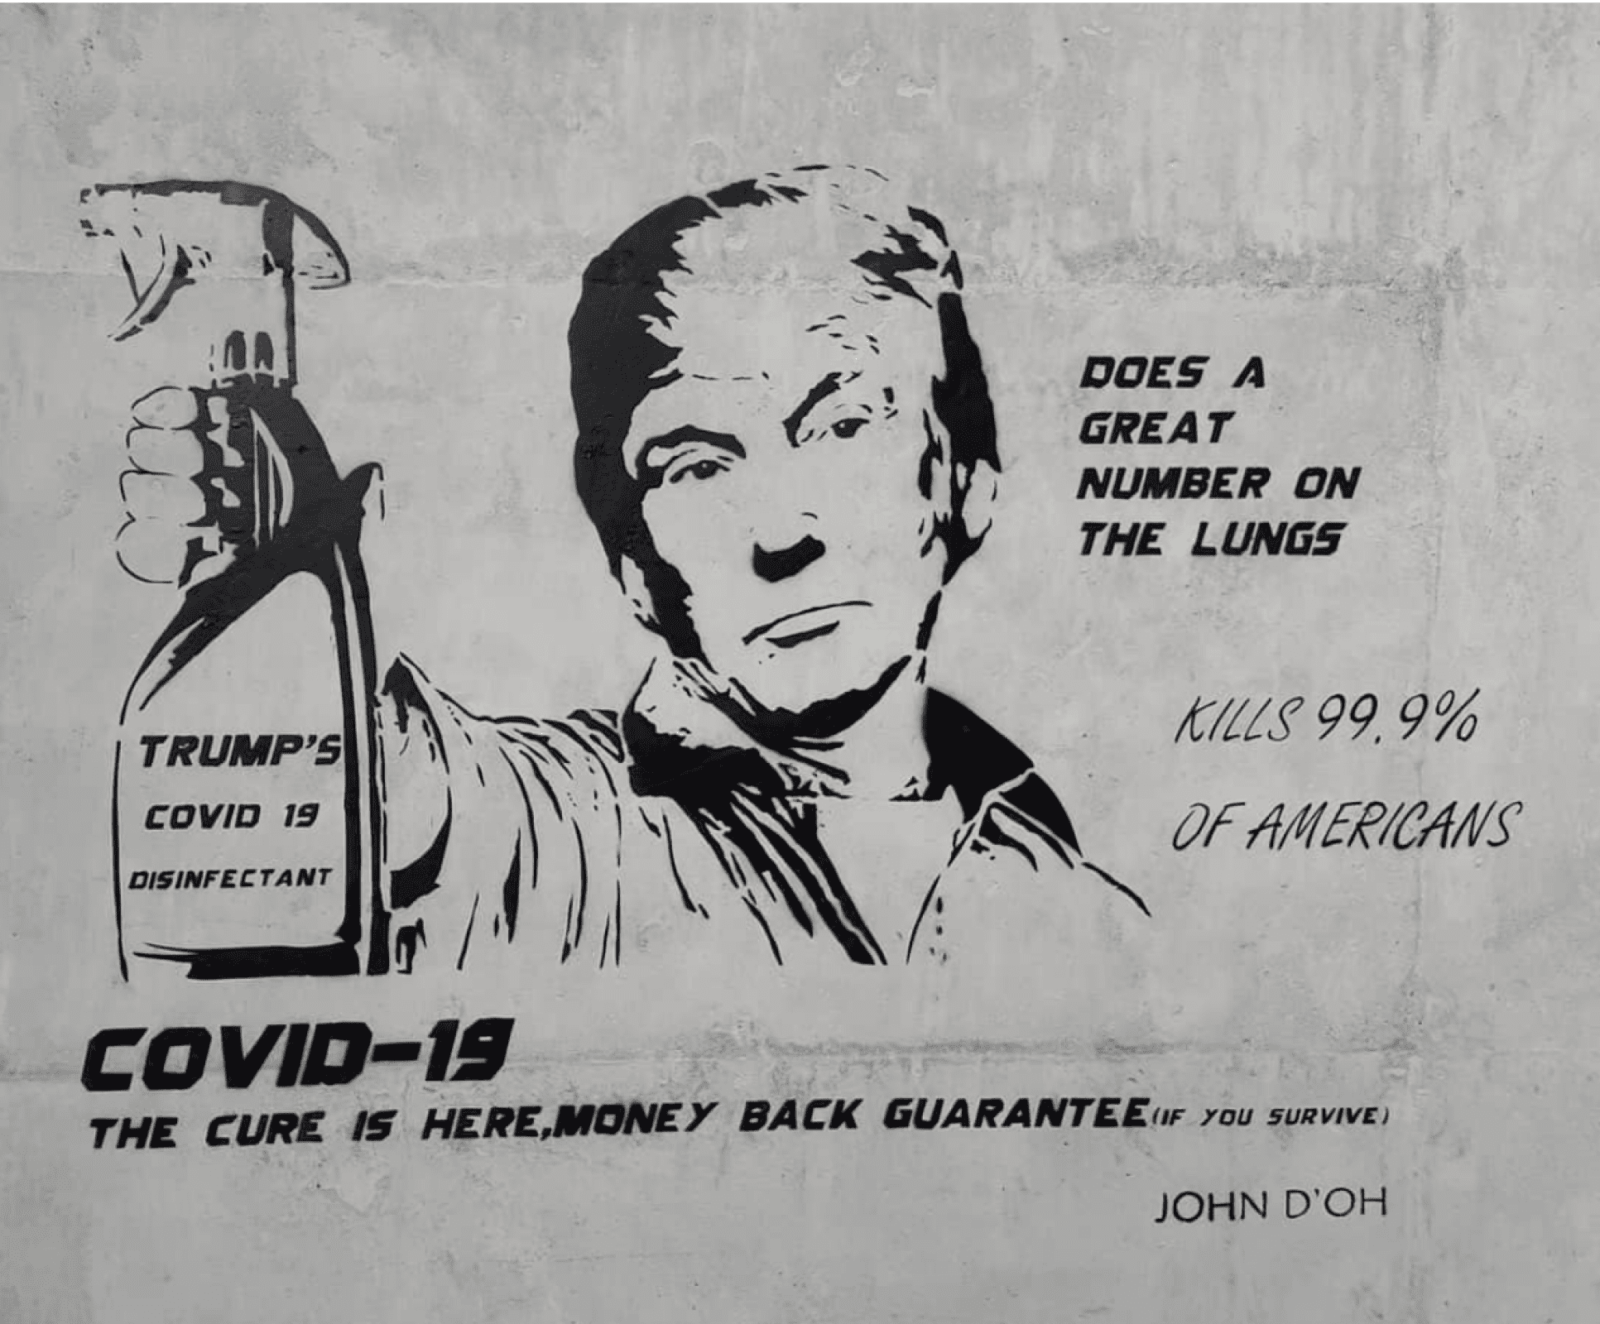 Street art digest: quarantine, new superheroes, and a lot of love